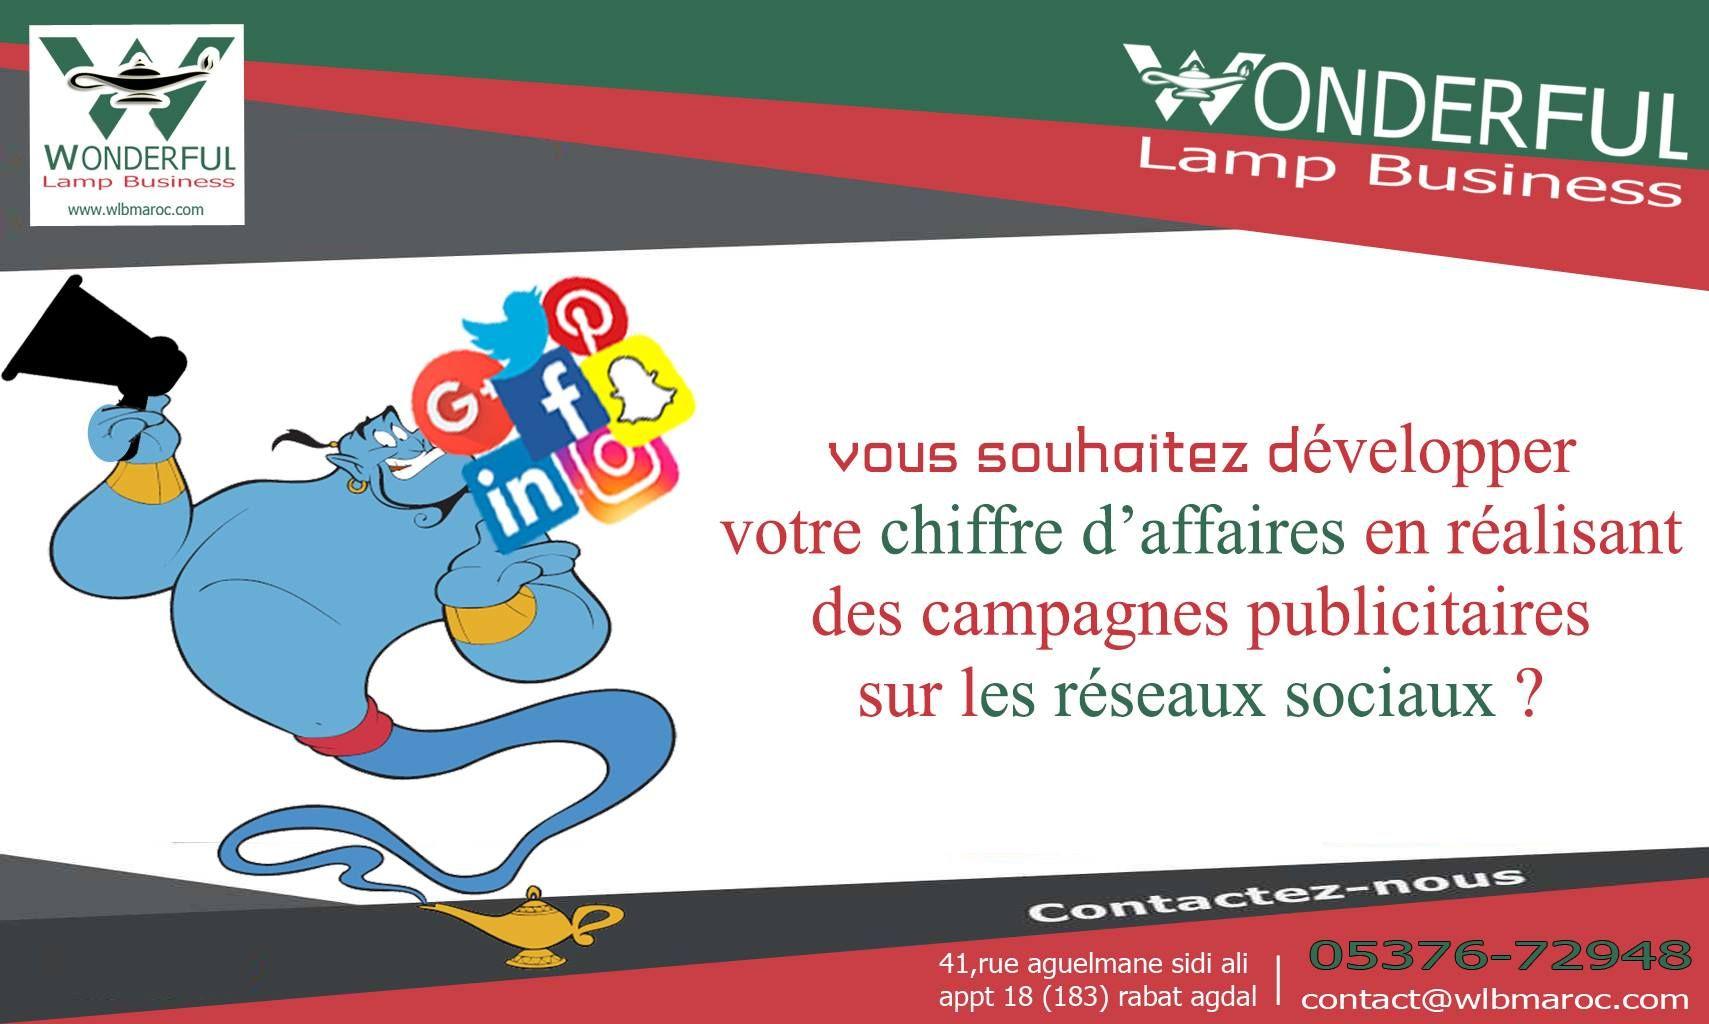 Pin By Wonderfullampbusiness On Wonderful Lamp Business Business